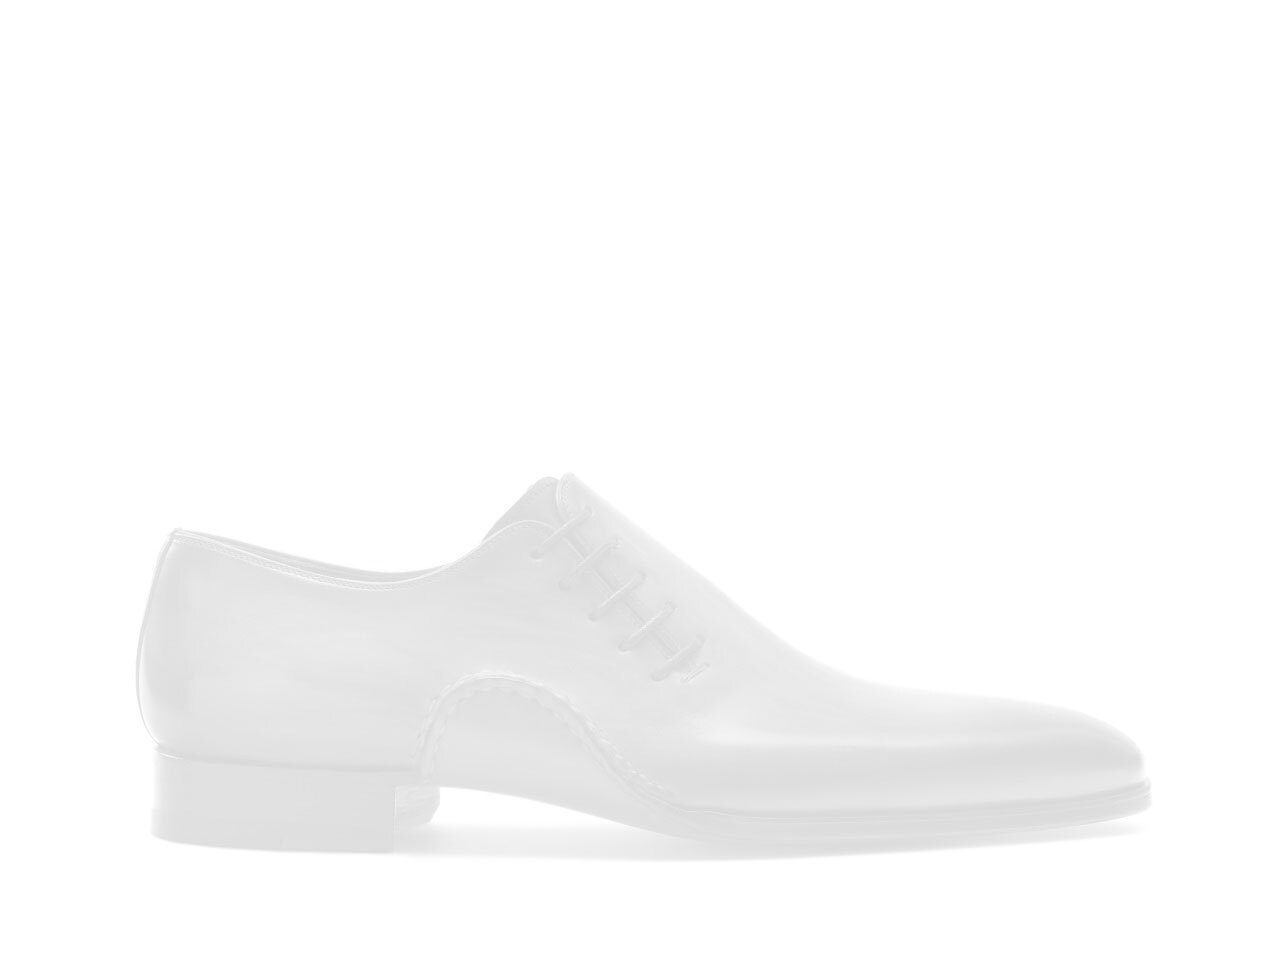 Side view of the Magnanni Playa Perf Grey Men's Sandal Slides